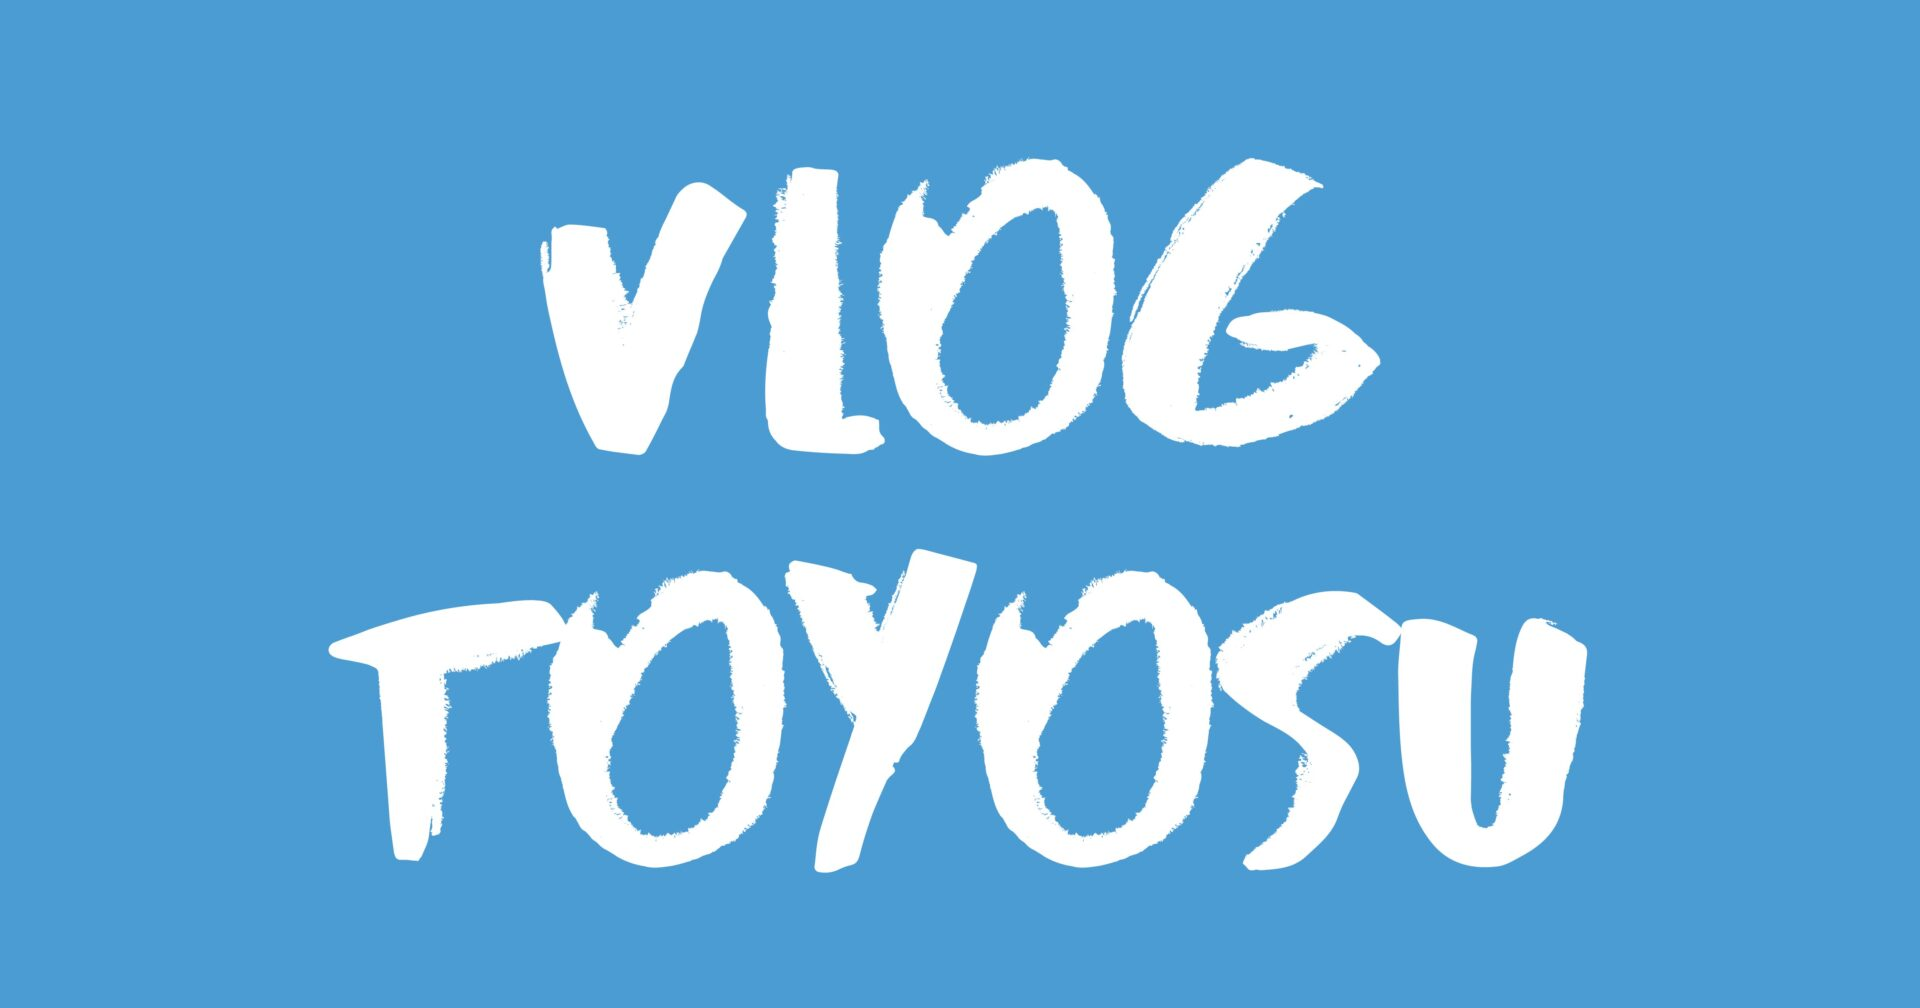 [Vlog] 豊洲 / Toyosu